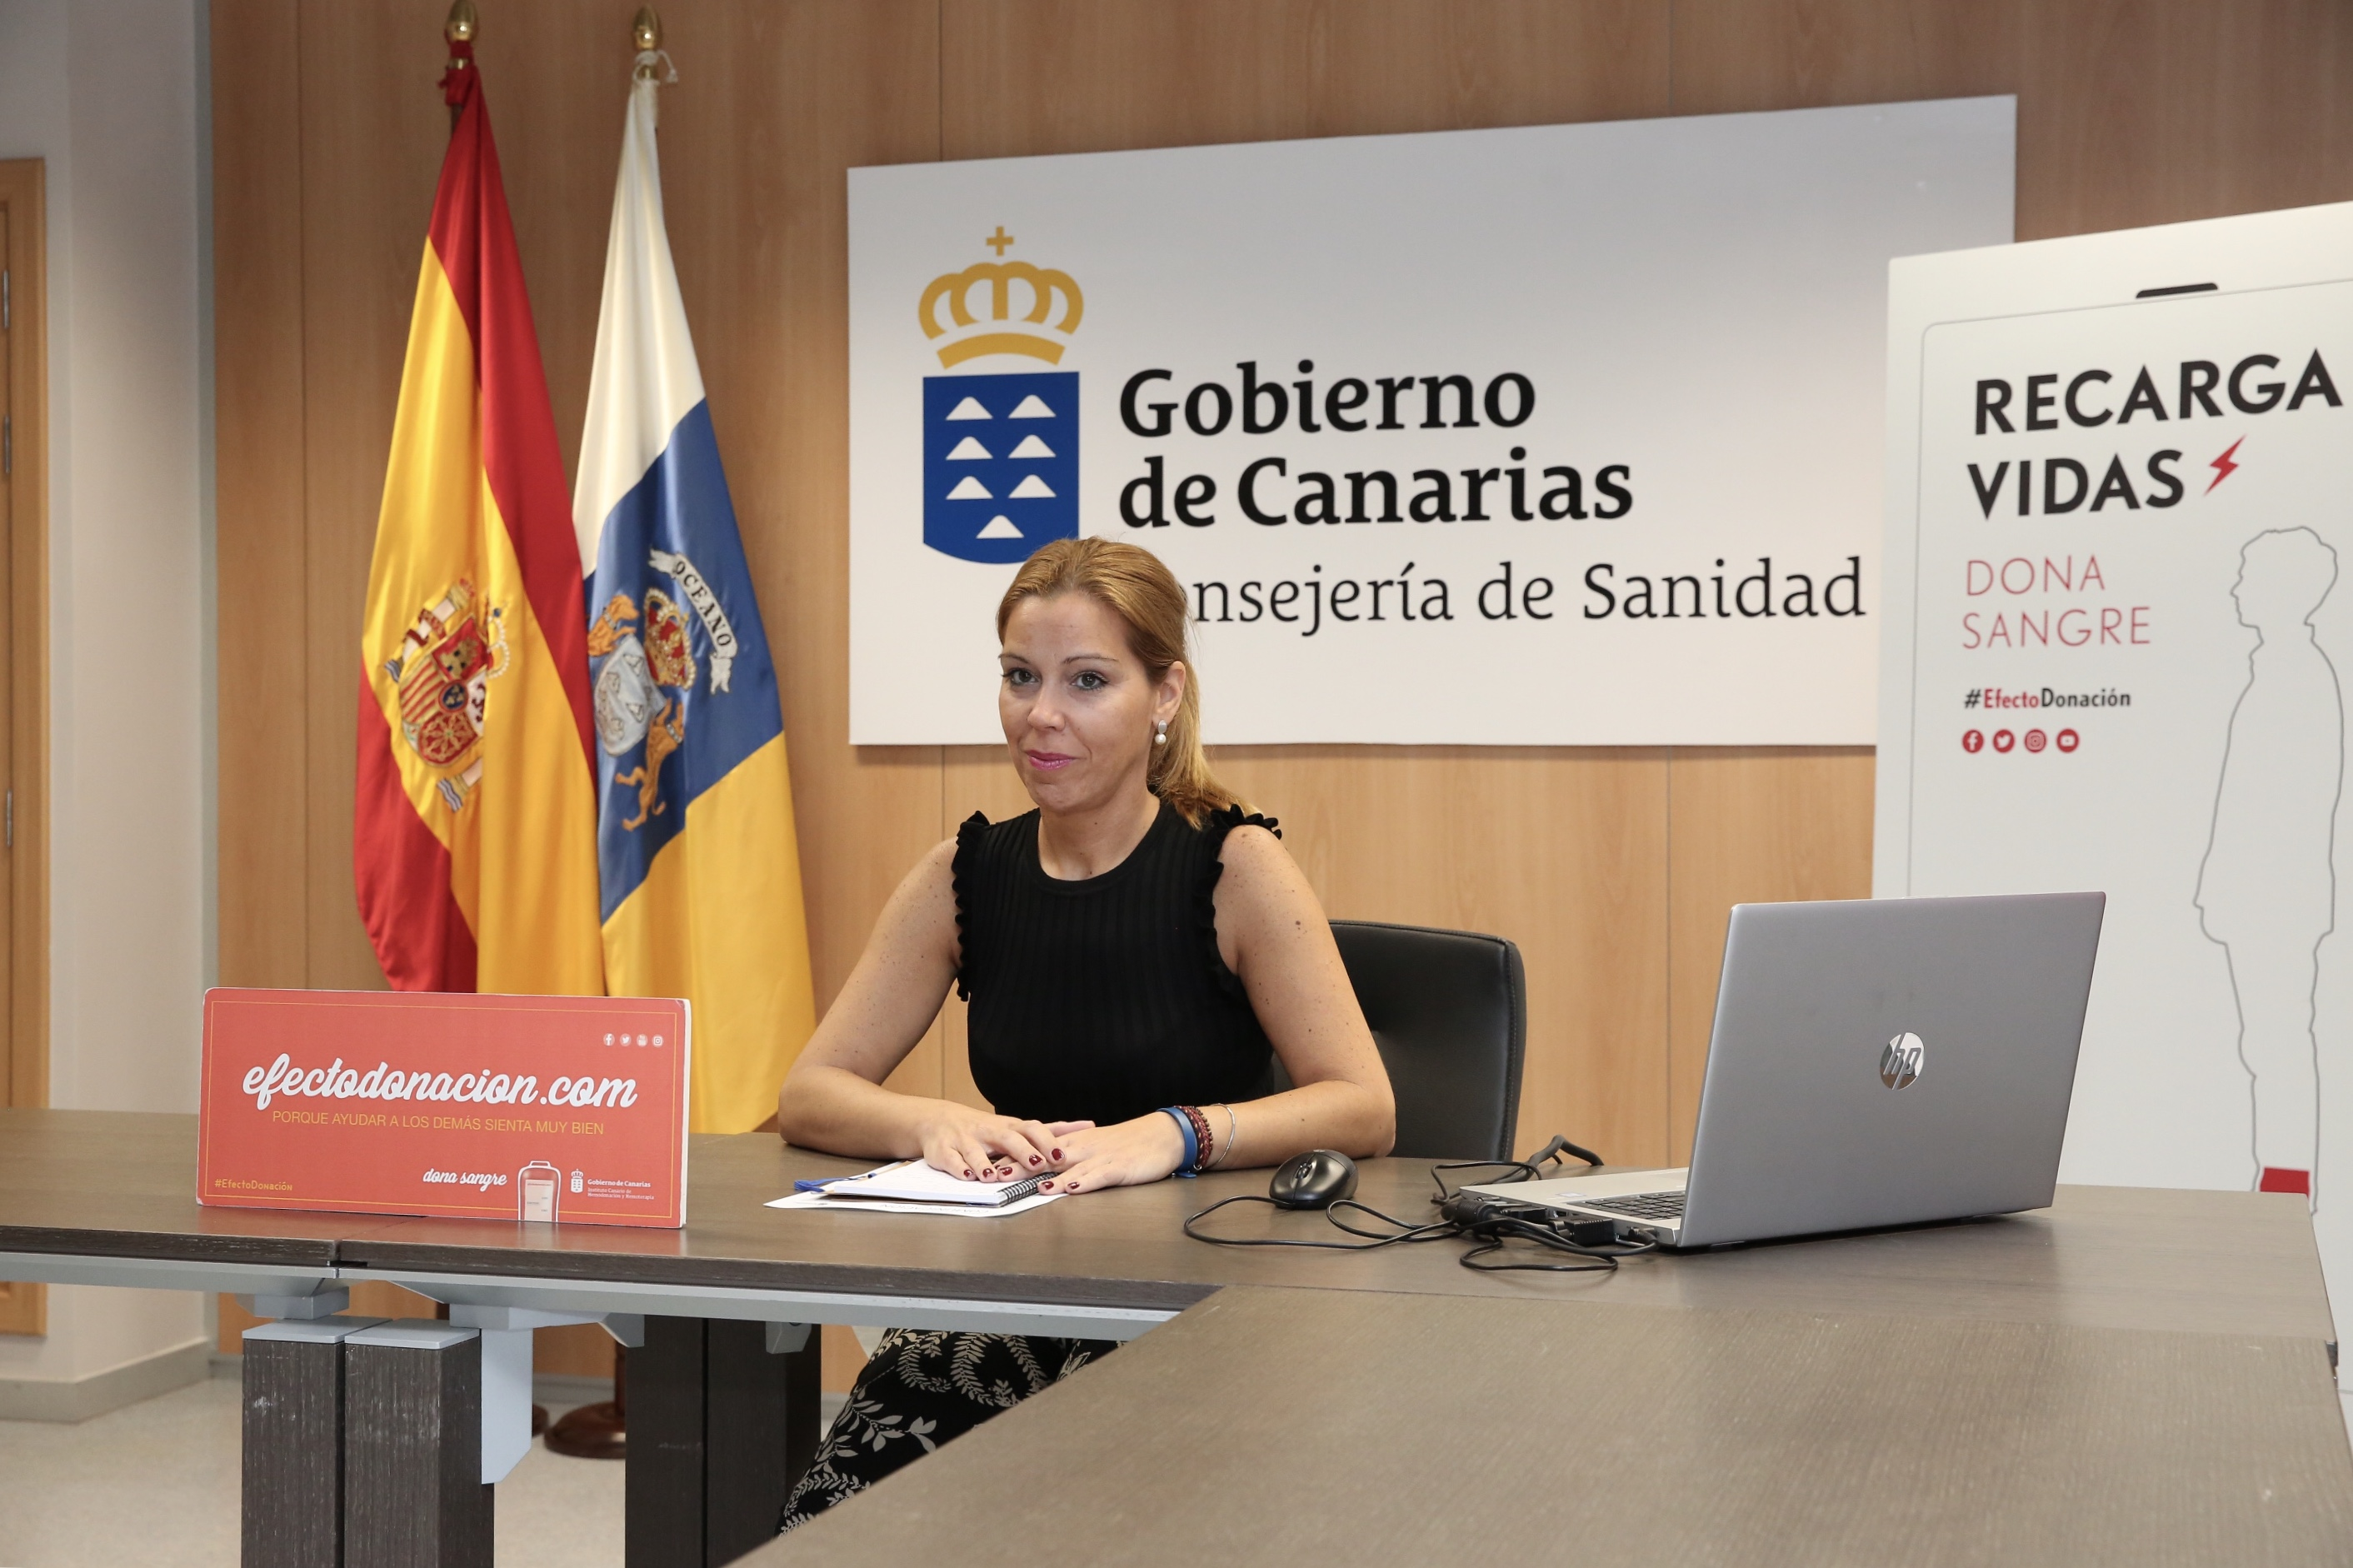 La presidenta del ICHH, Begoña Reyero